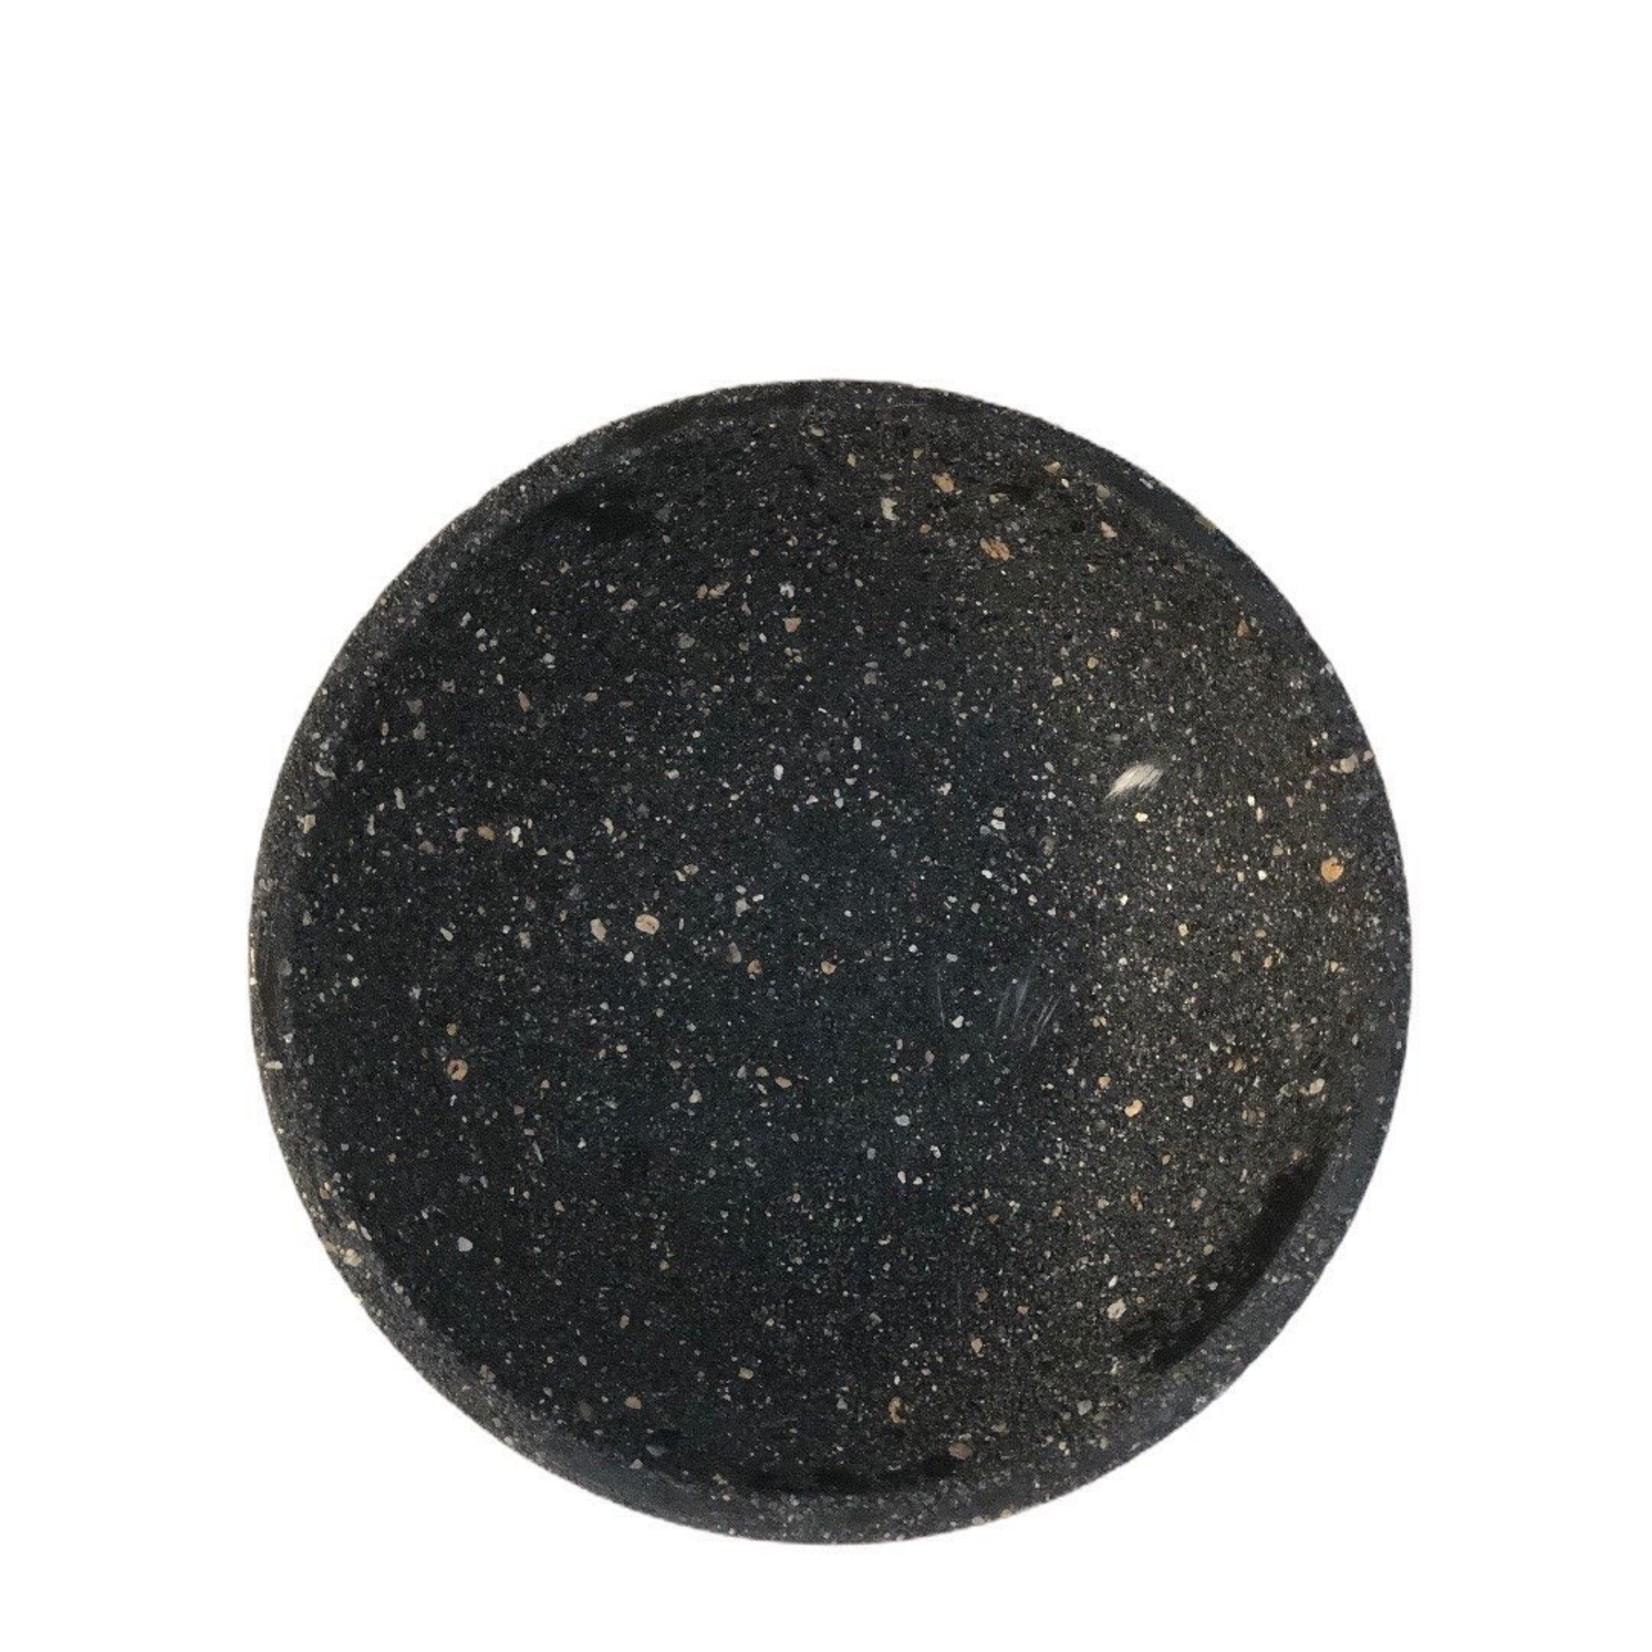 Hagelsieb Black TErawZZO Circle Incense Holder